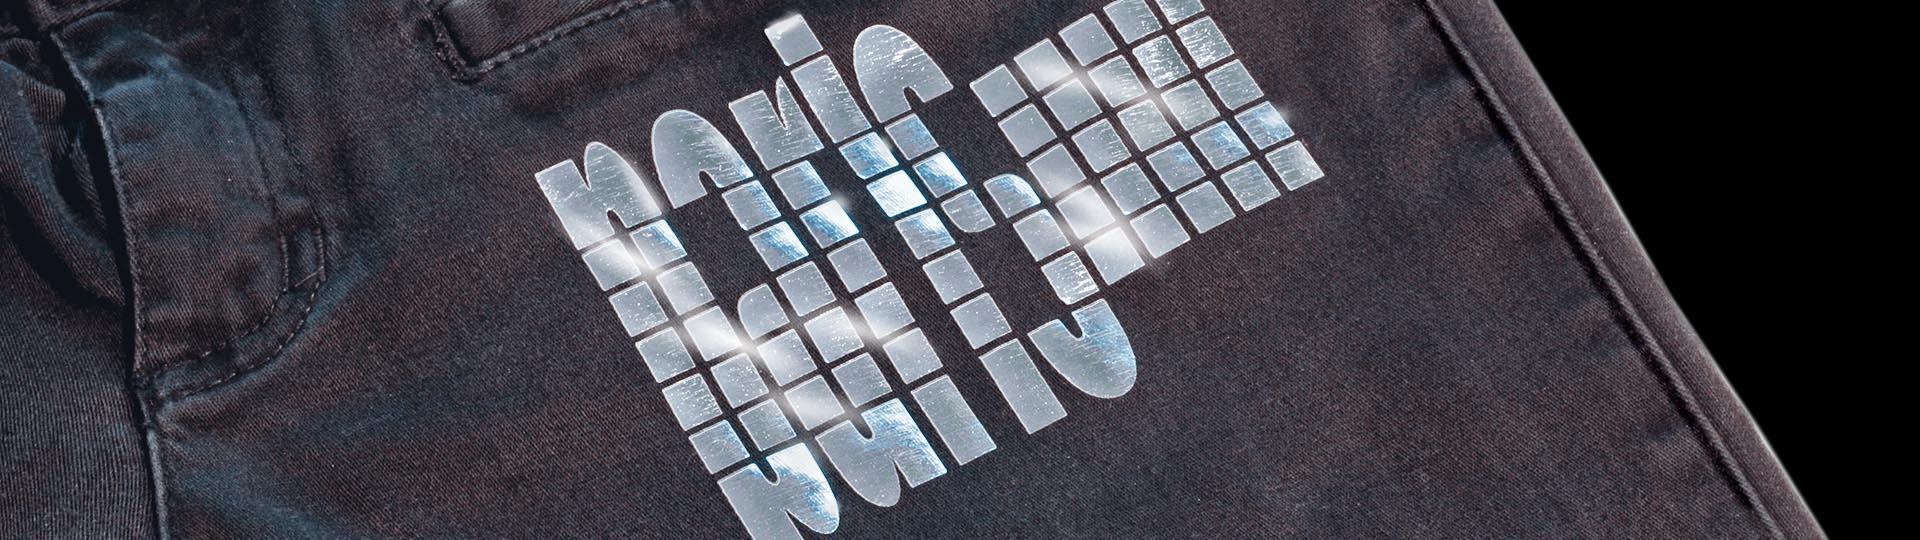 TRANSFERT MIROIR - image 4